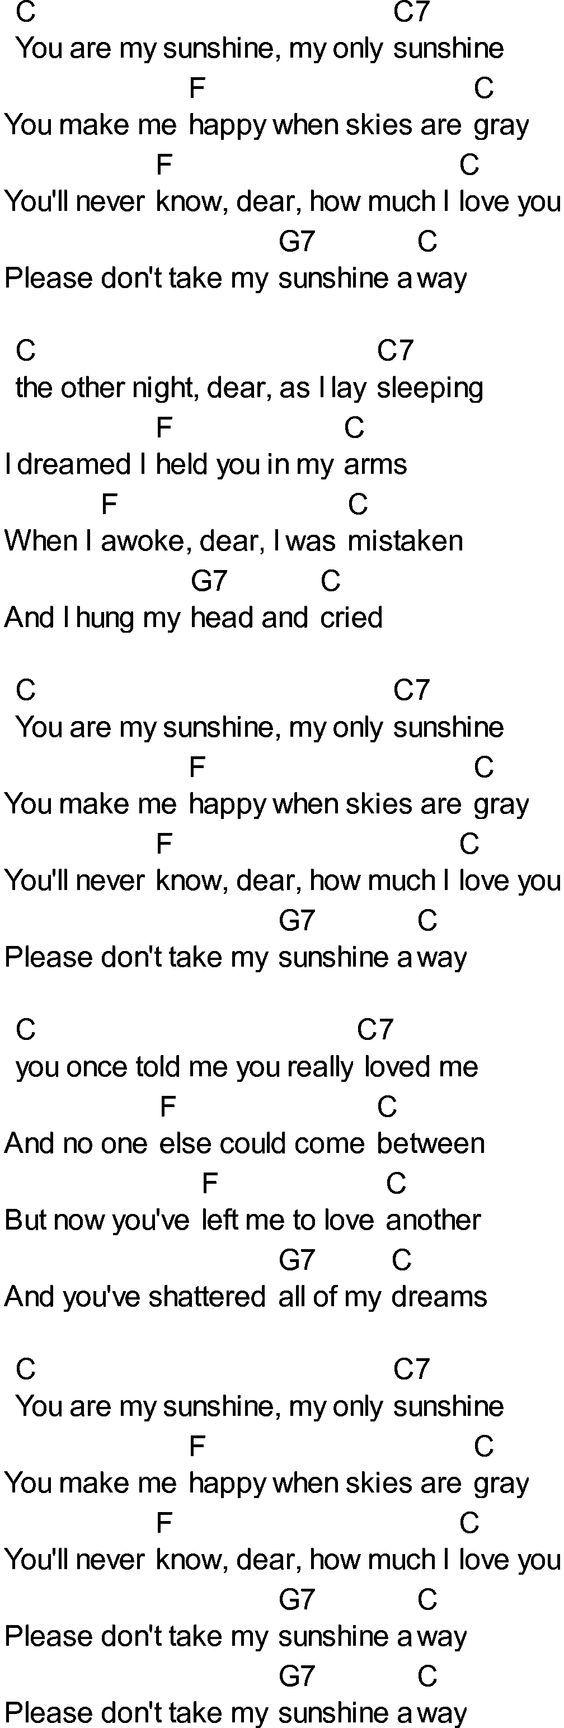 Johnny Cash Song Lyrics amp Guitar Chords  Play Country